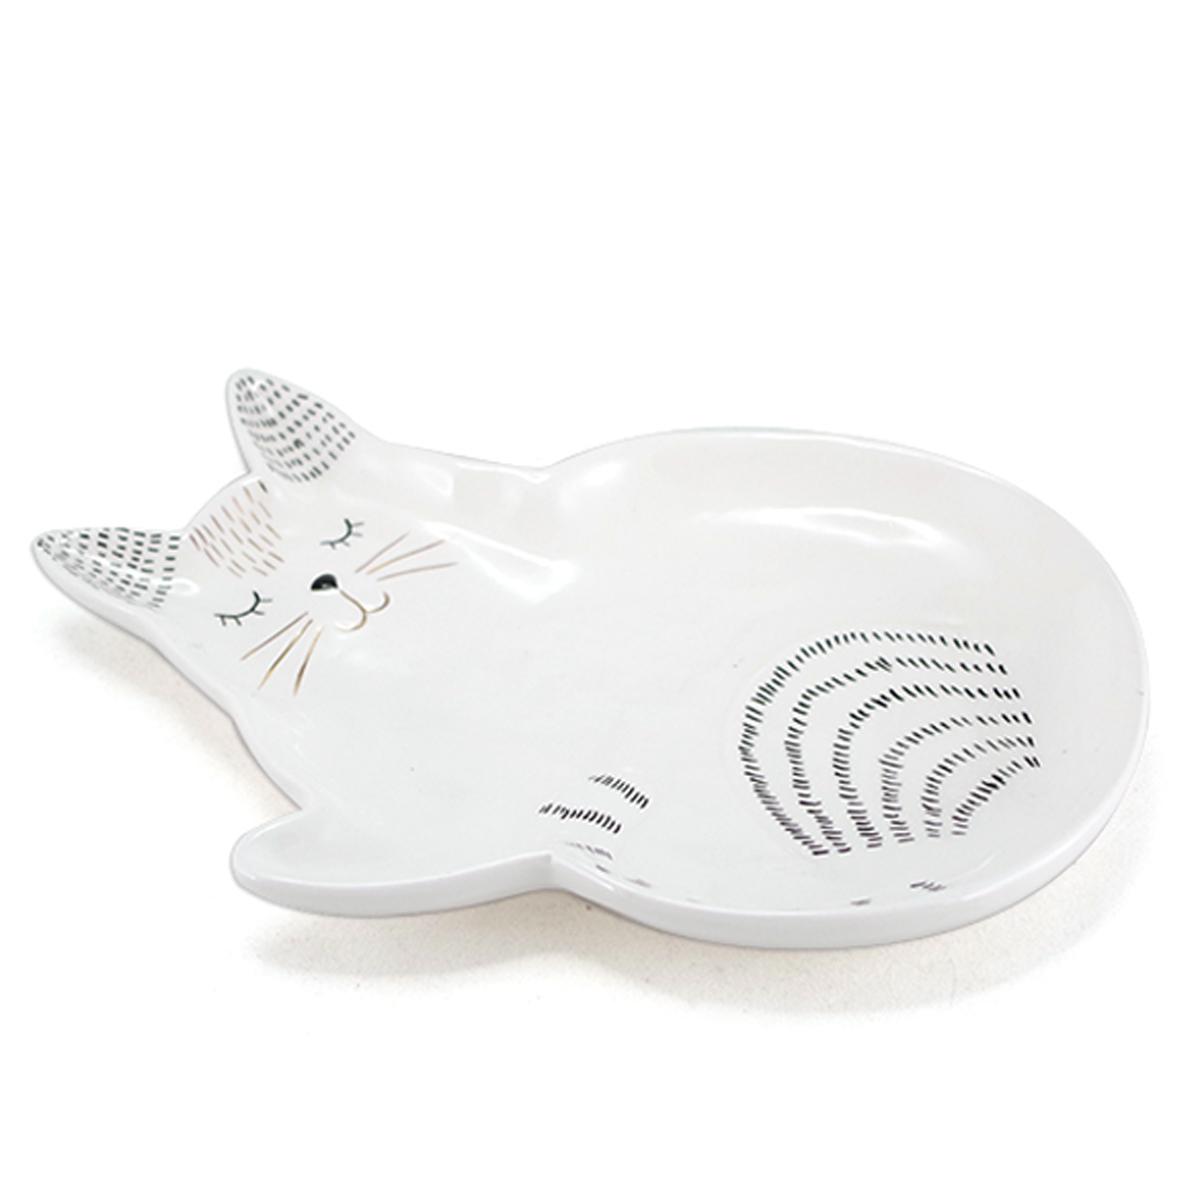 Vide-poches céramique \'Chats\' blanc - 245x165x25 cm - [A1182]